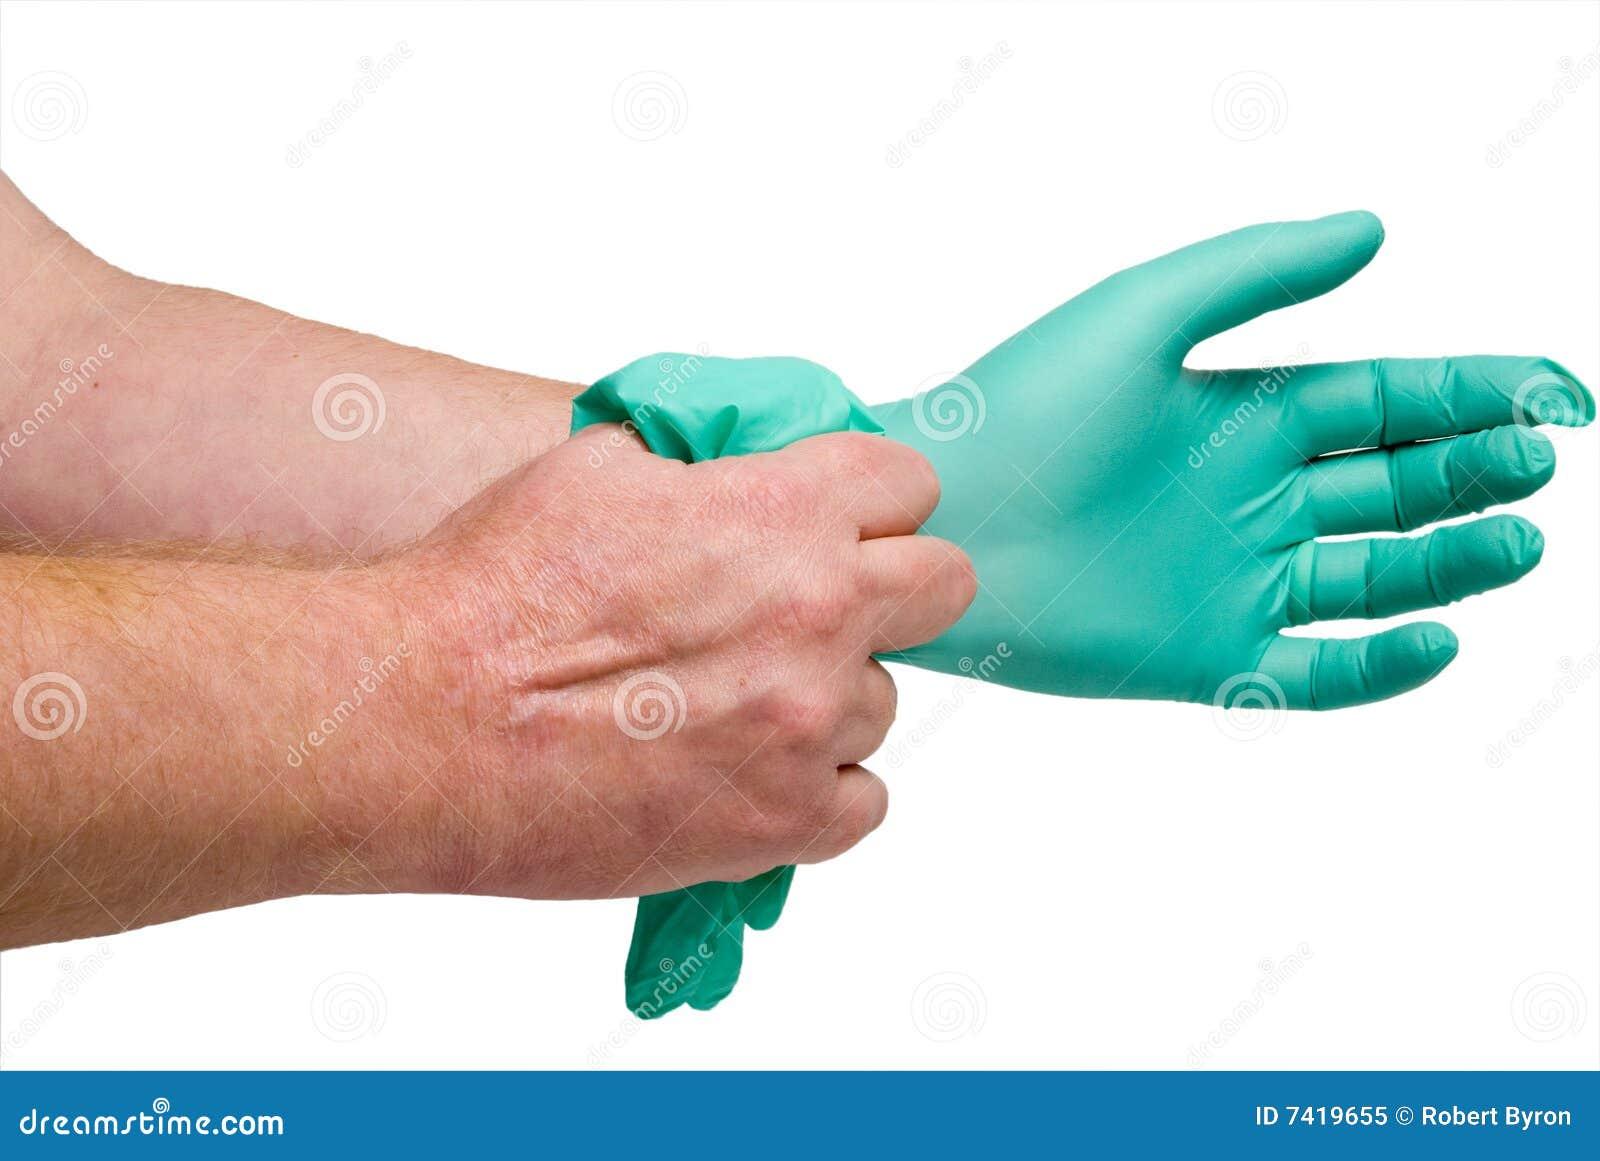 Gants médicaux libres de latex